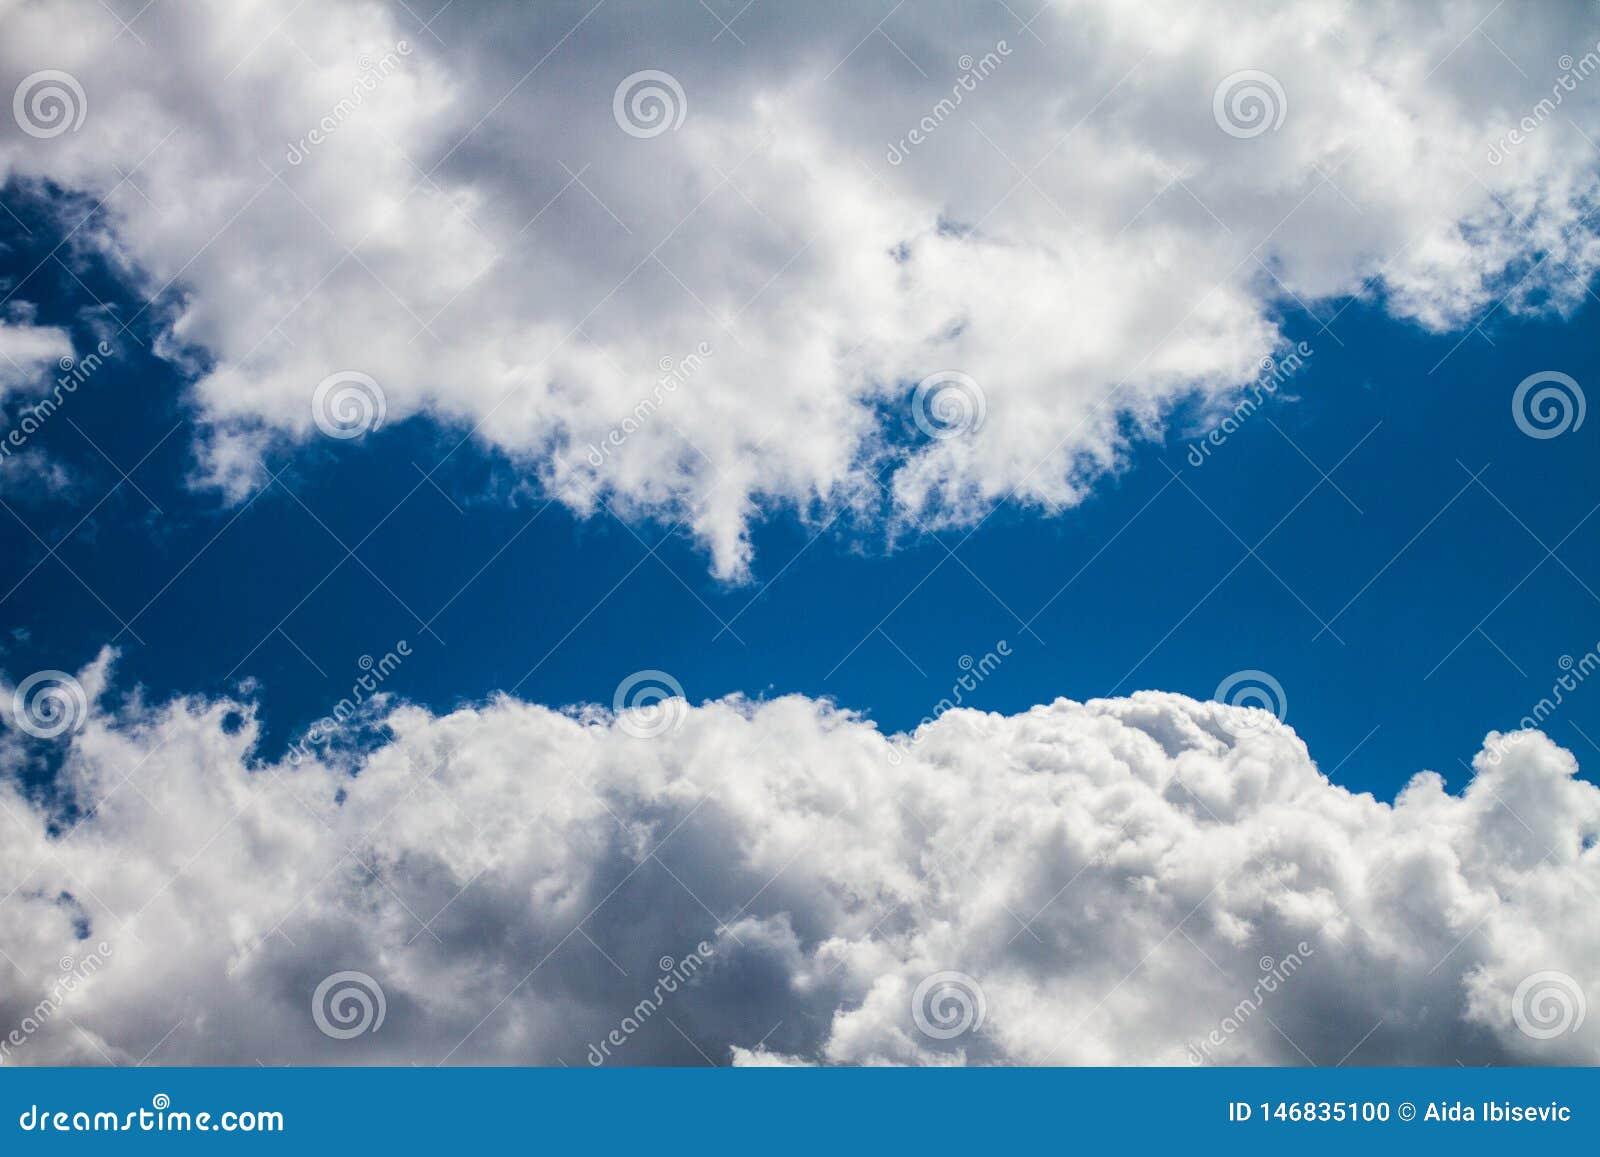 Nuages de Celestial Navy Blue Sky With